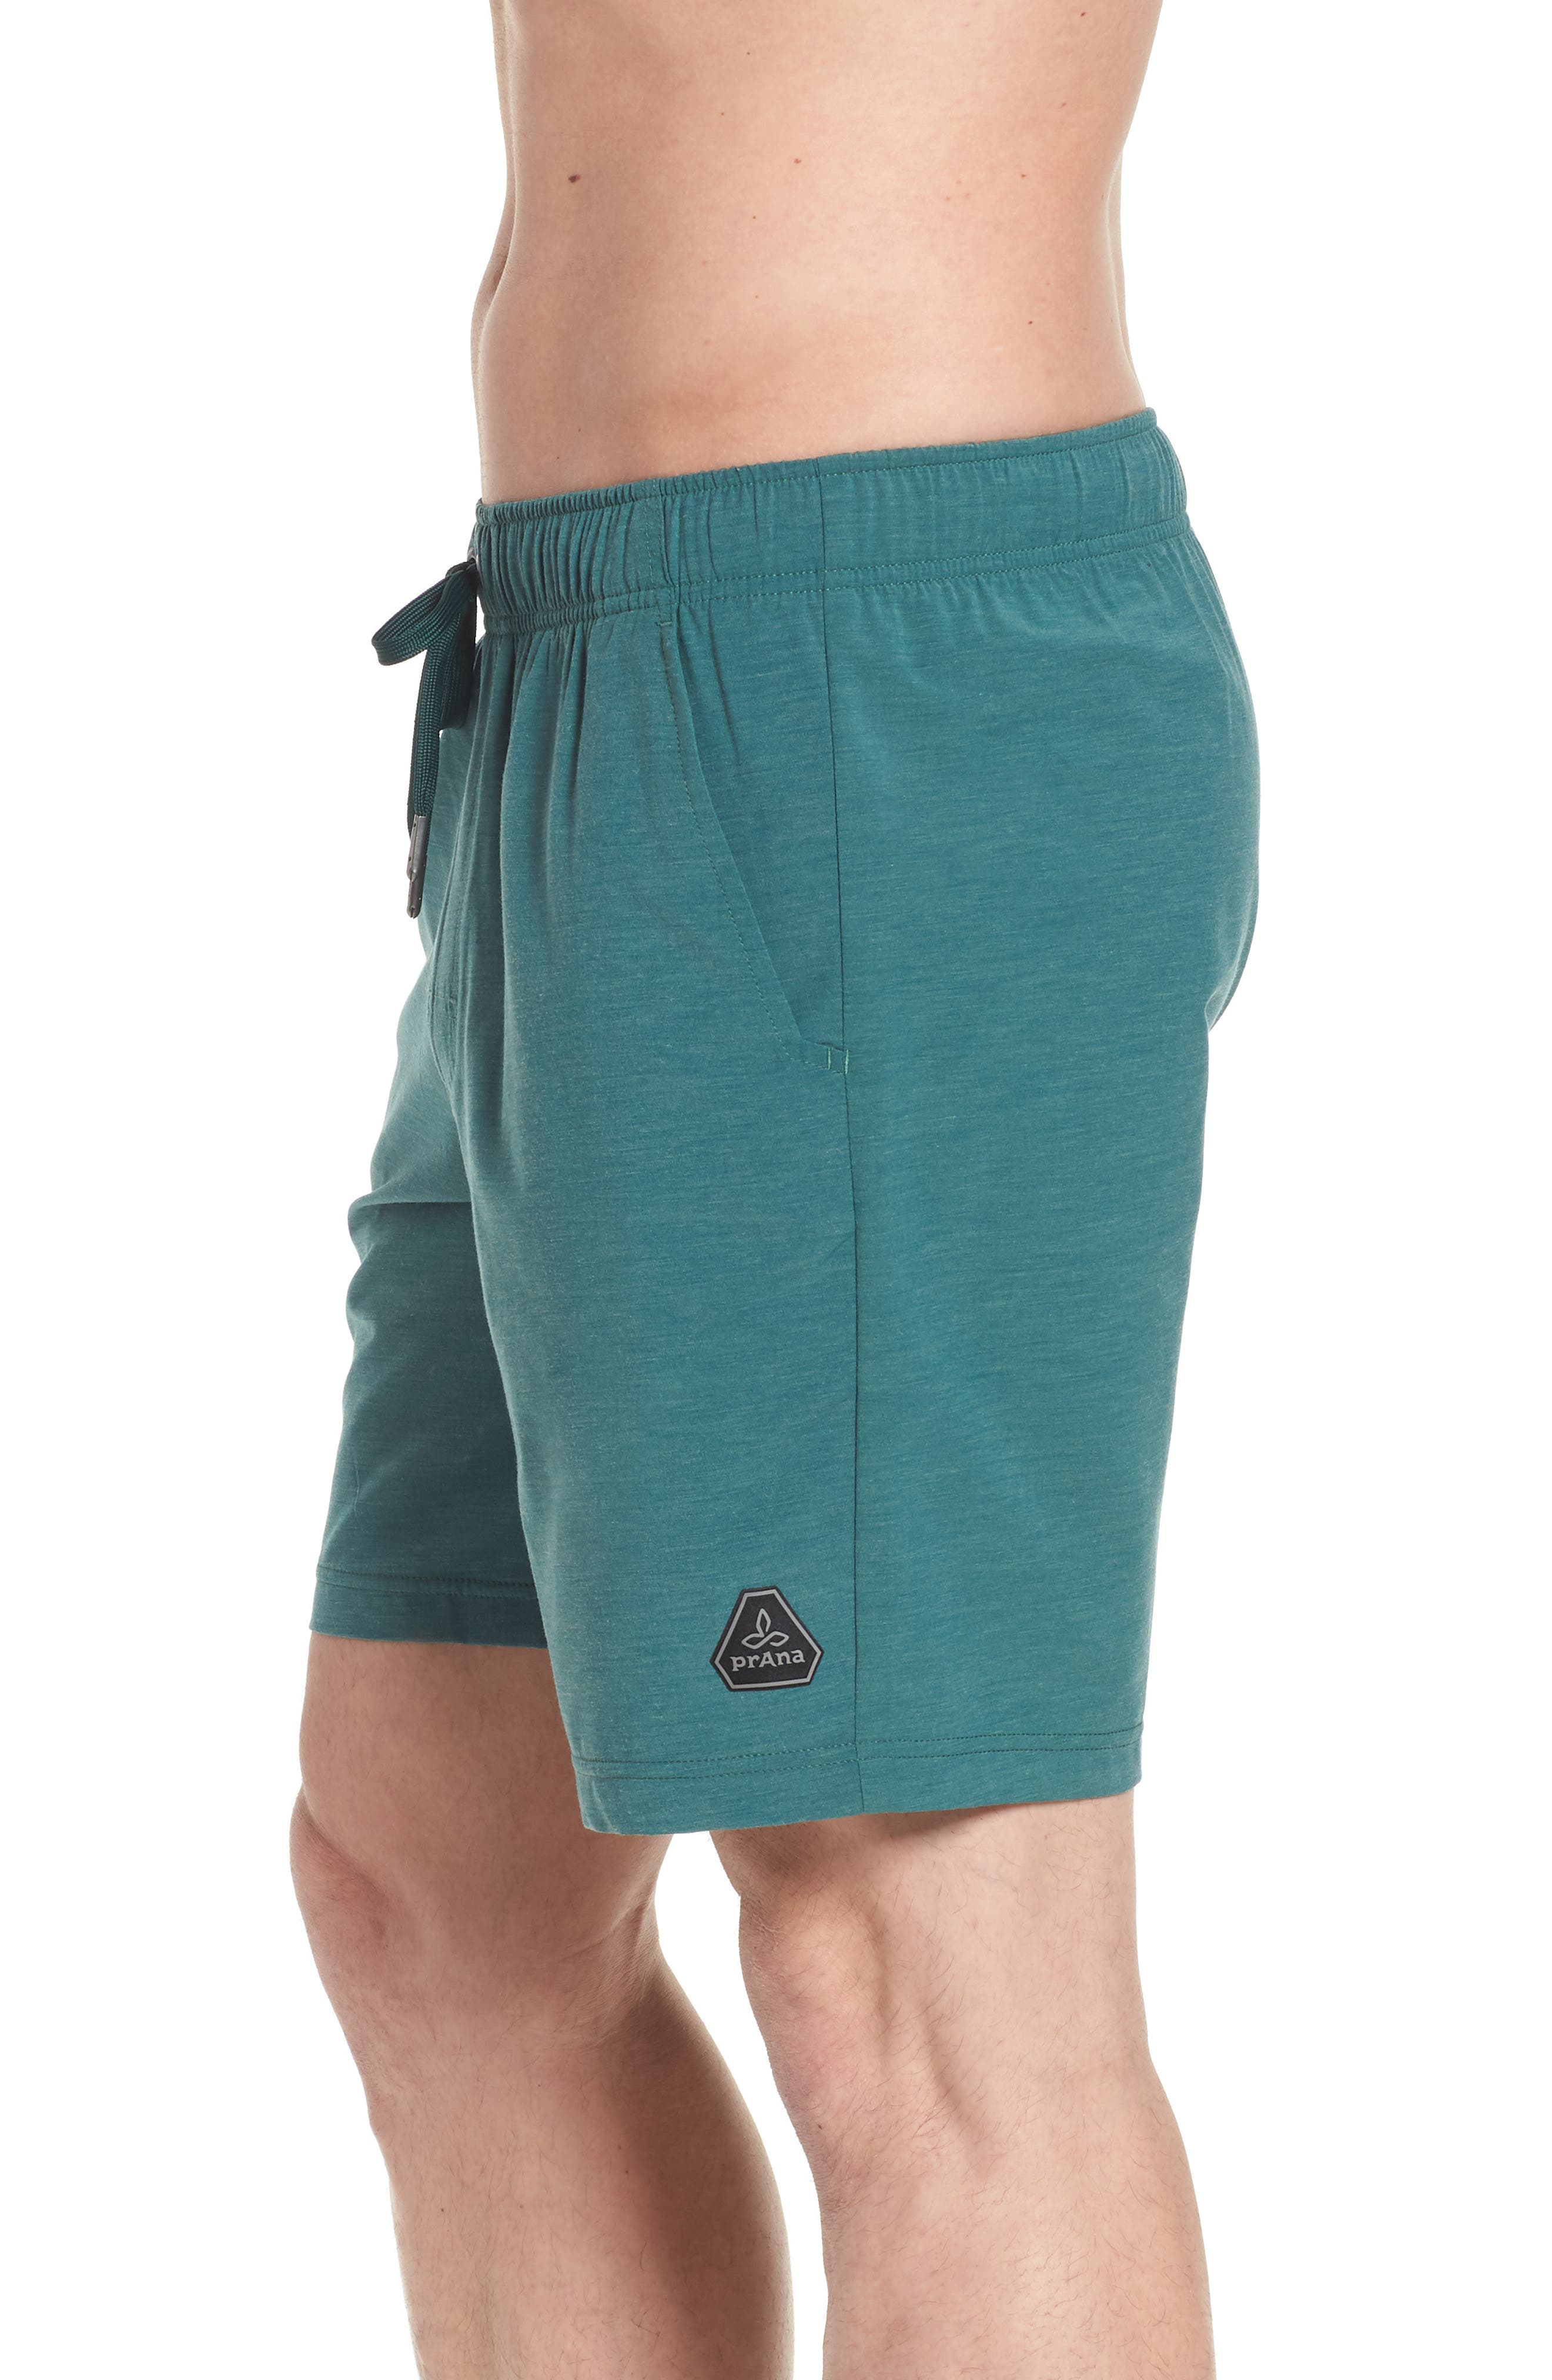 Metric Board Shorts,                             Alternate thumbnail 3, color,                             300